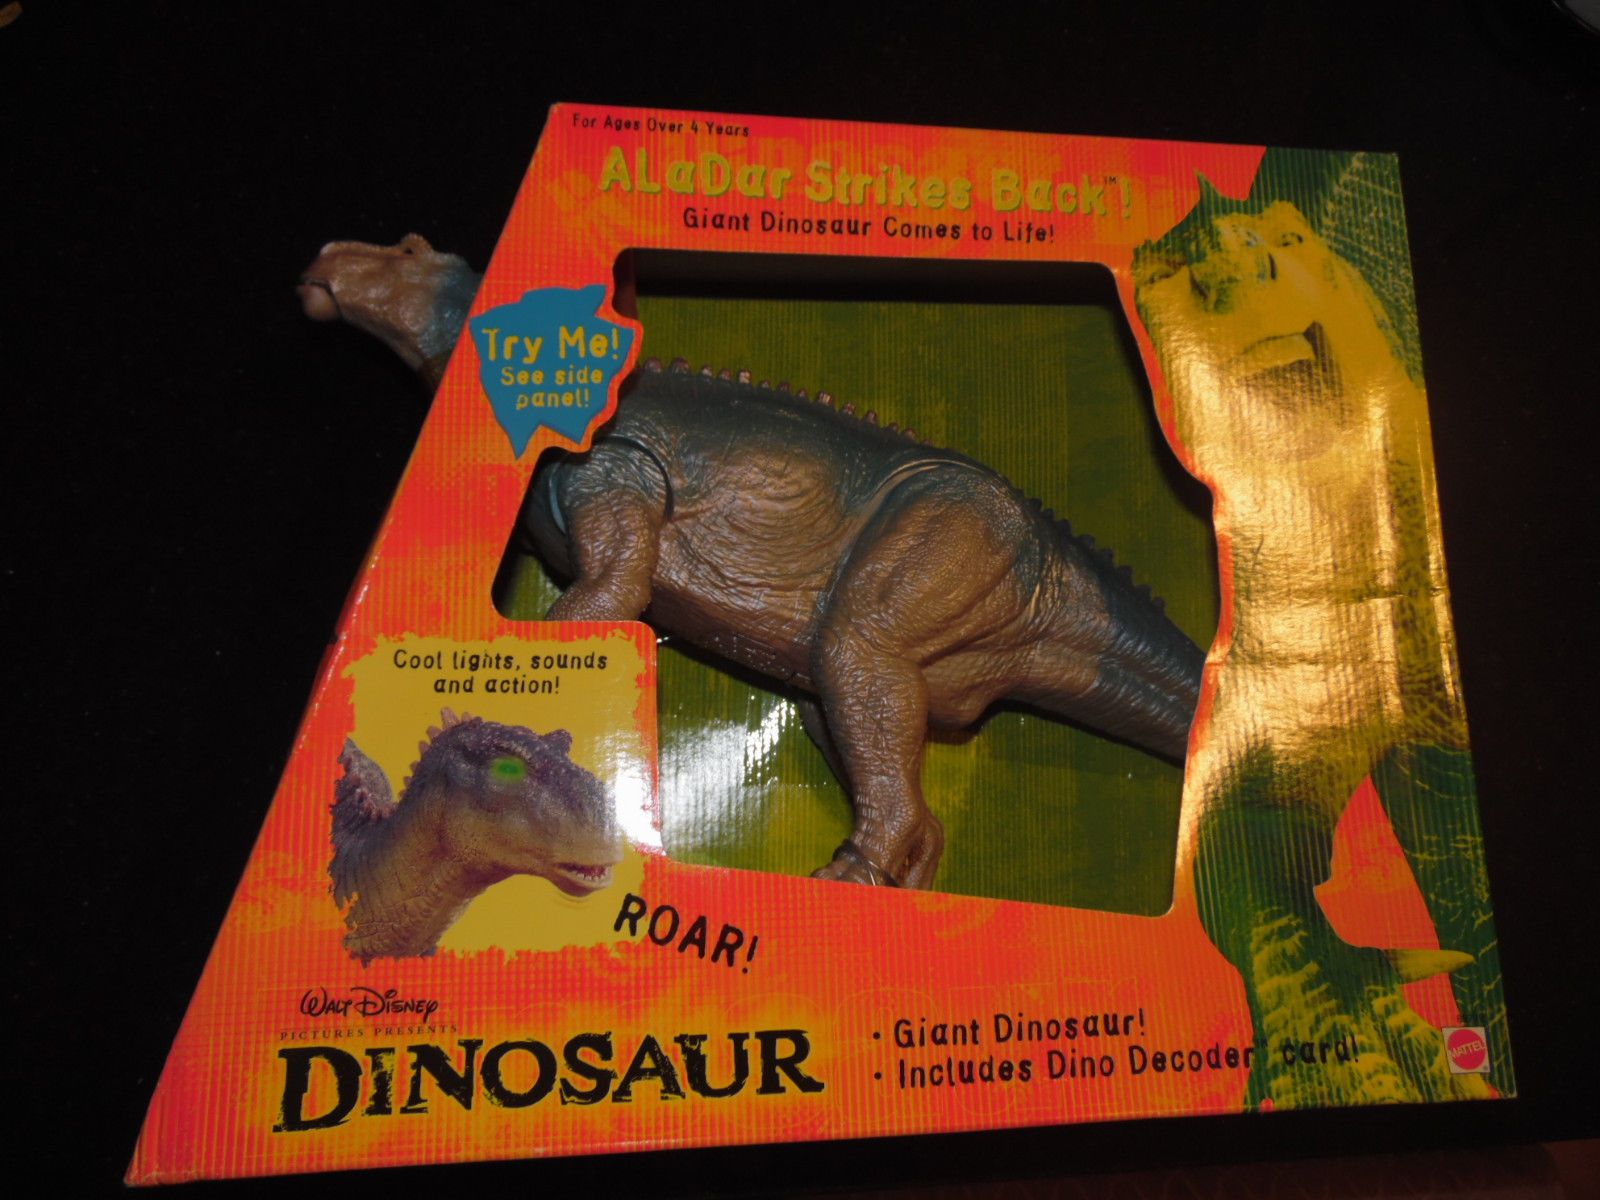 Disney Dinosaur Toys : Dinosaur toys mattel walt disney aladar strikes